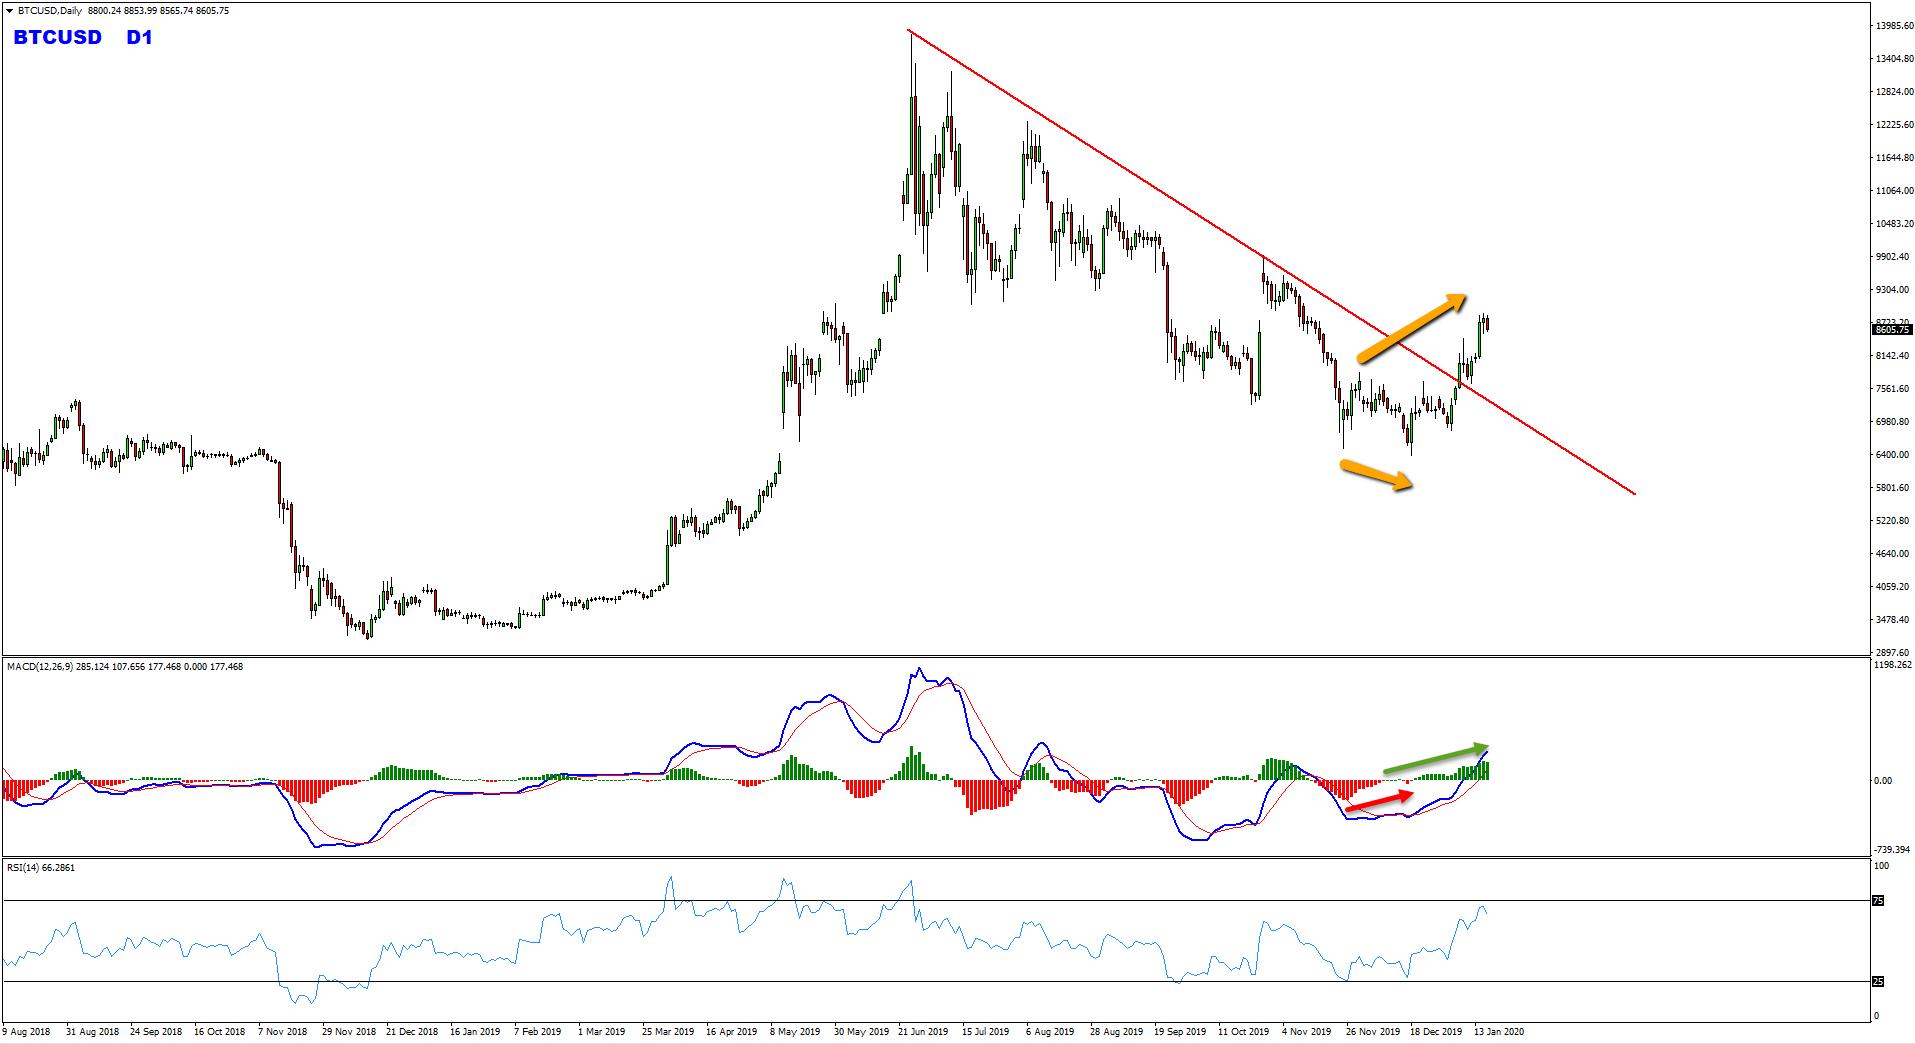 Trade Idea - Bitcoin Buy Setup After Bearish Trend Line Breakout